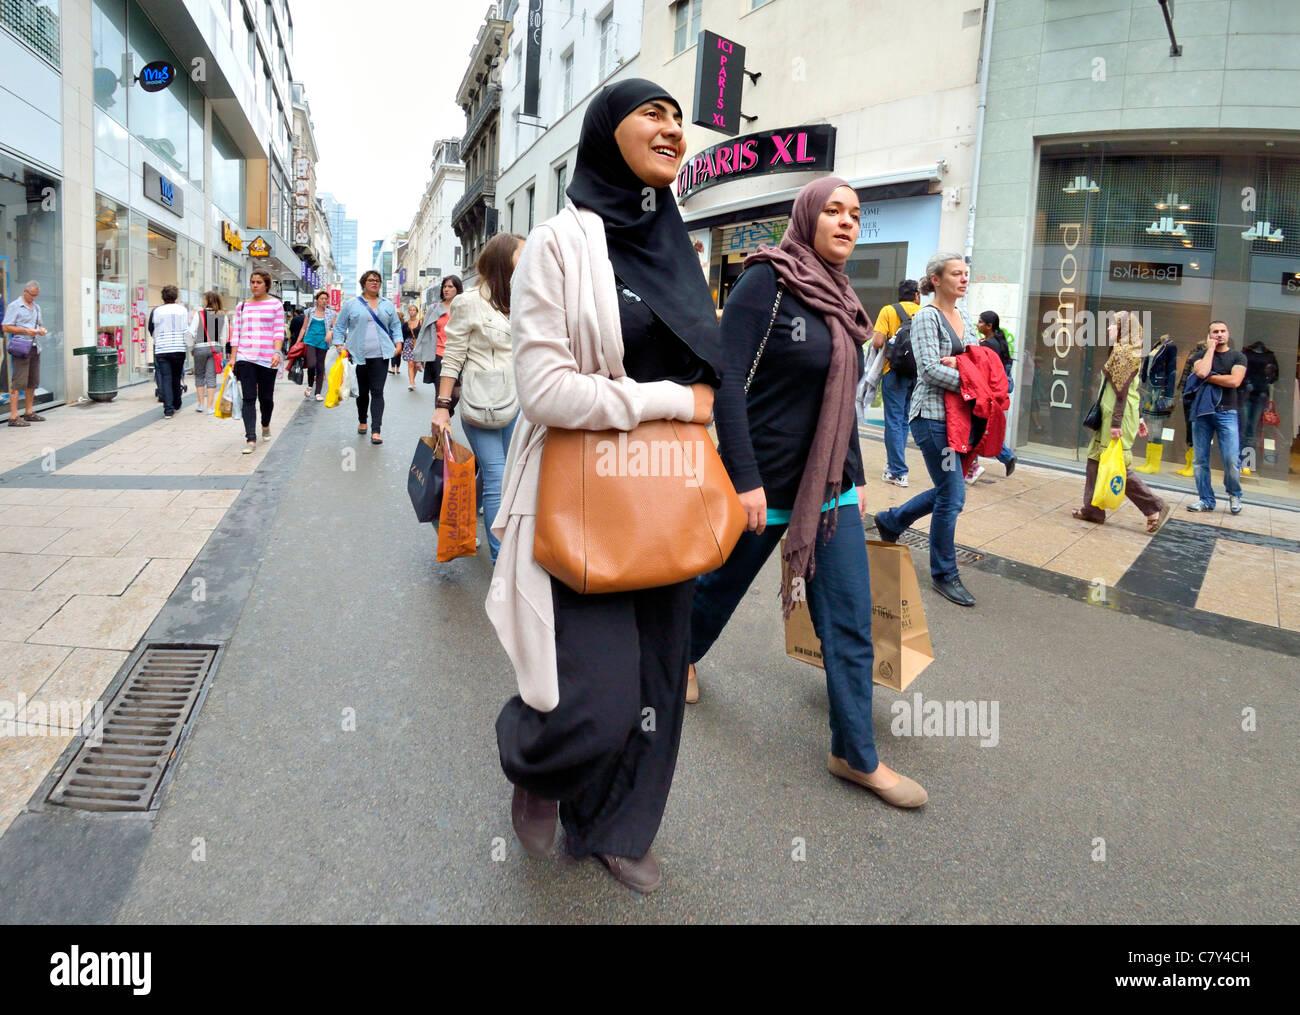 Brussels, Belgium. Two women in headscarves walking down shopping street - Stock Image